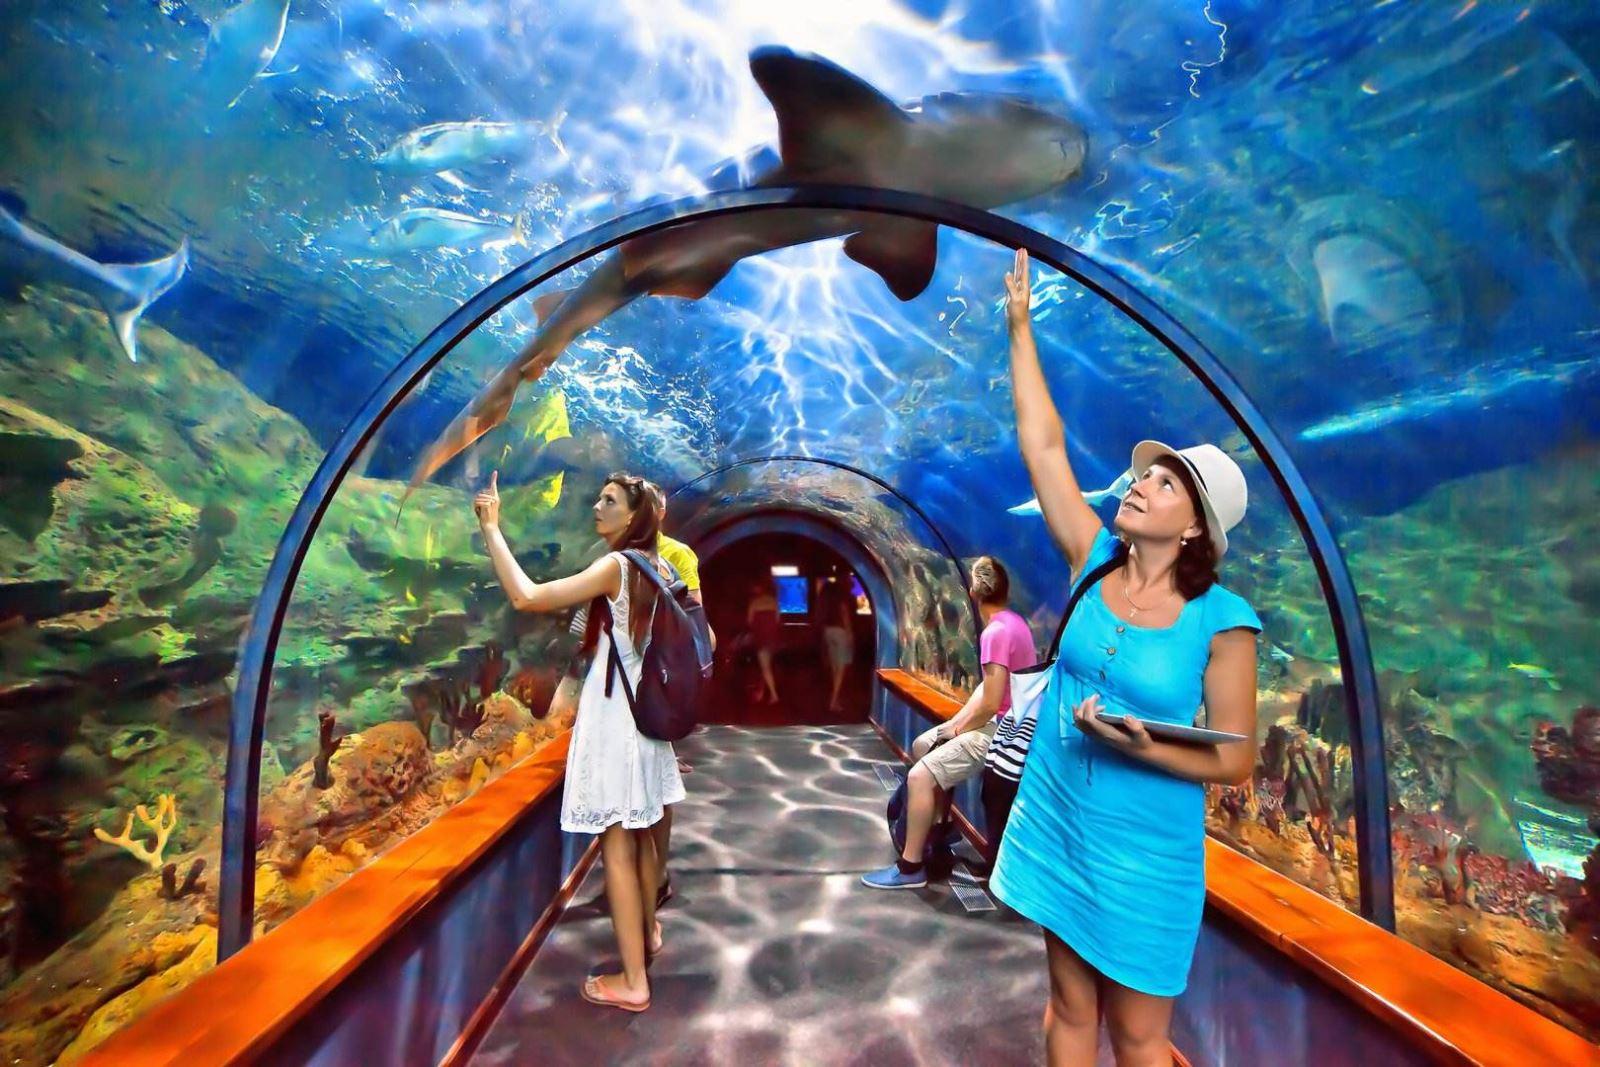 1-Day Singapore SEA Aquarium E-Ticket